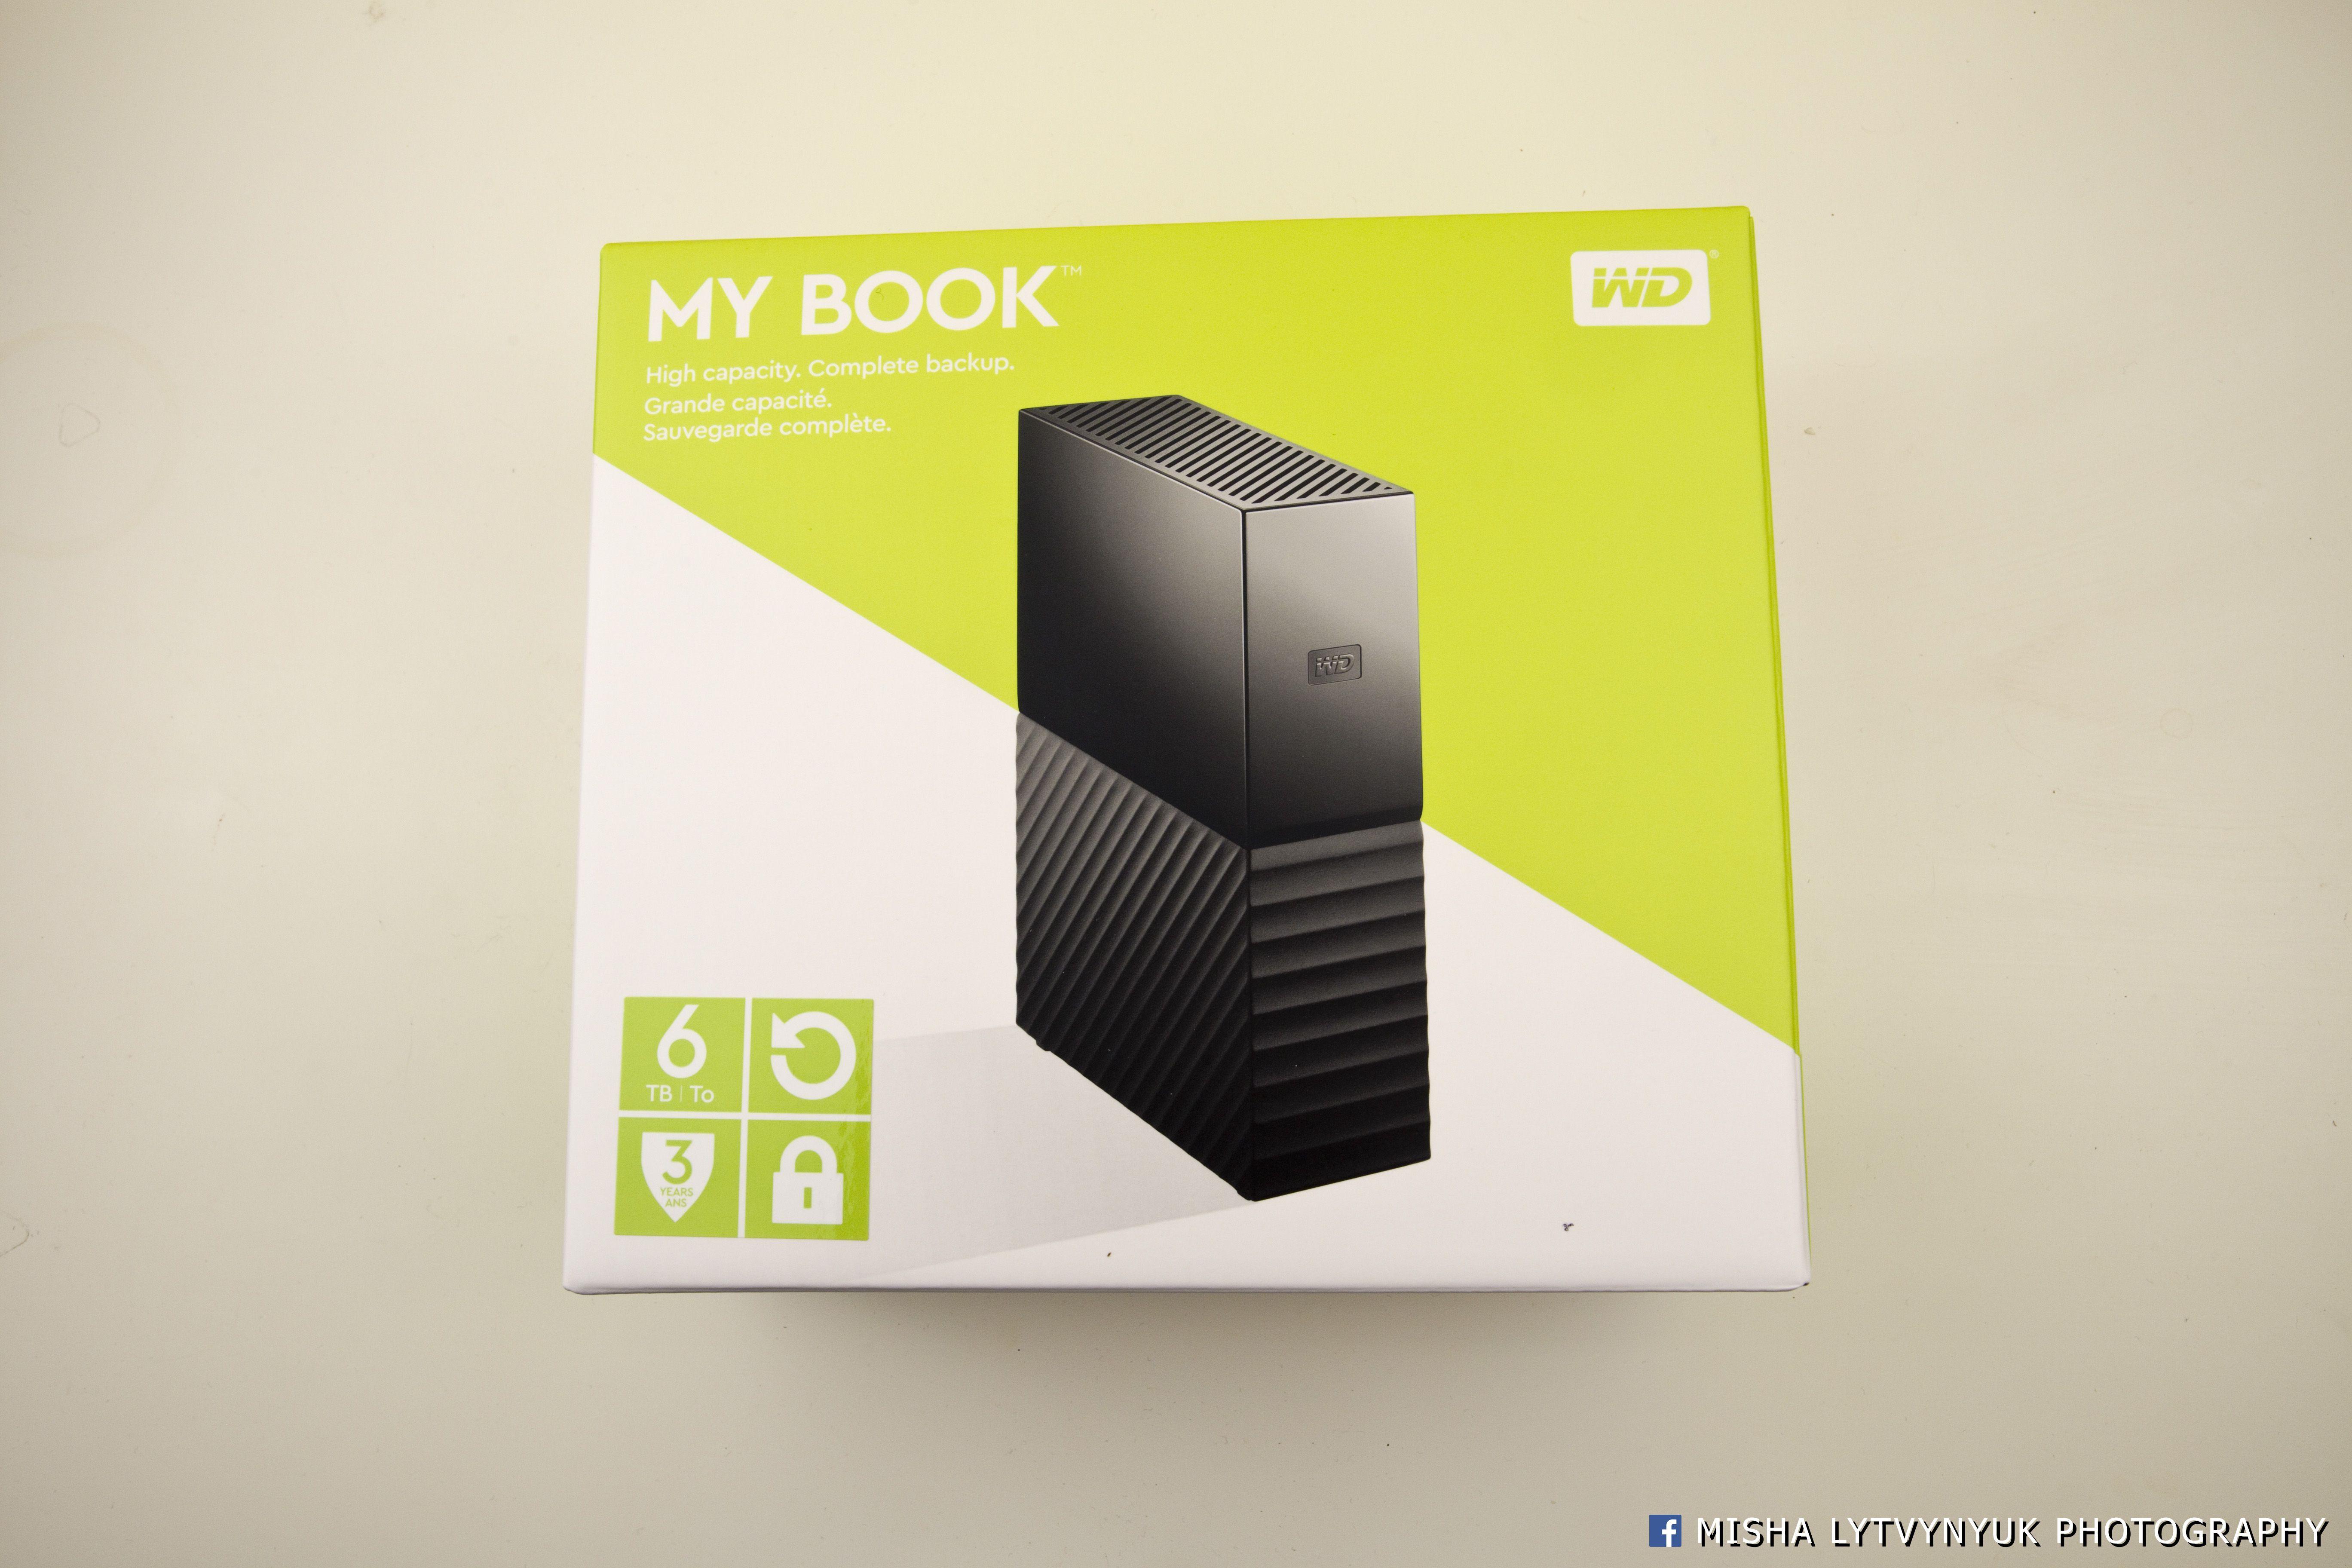 WD My Book 6TB benchmark - Mobile Modding